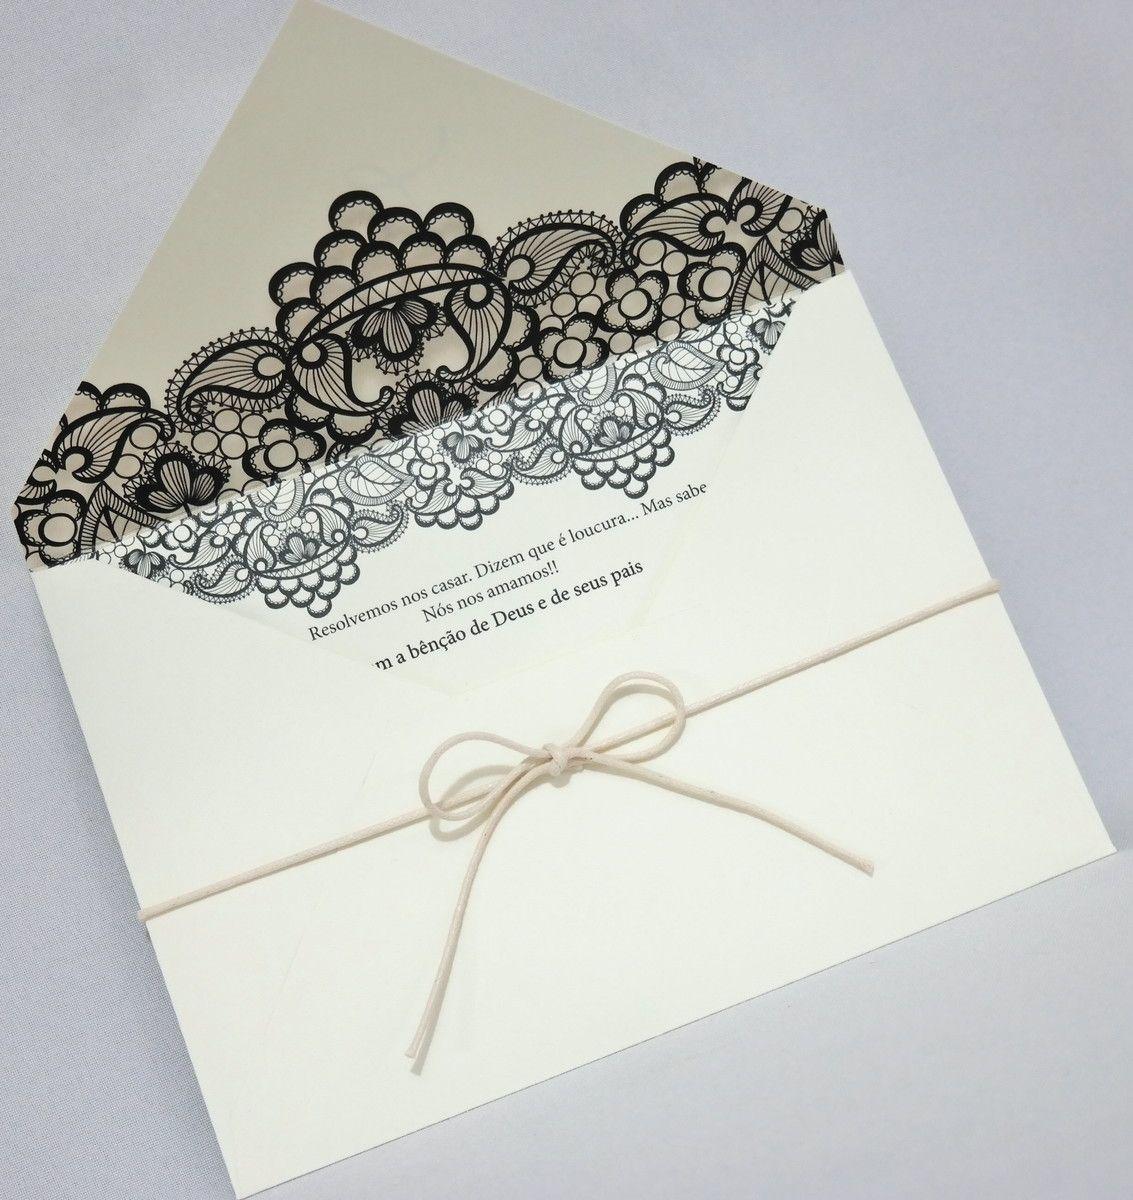 Convite para Casamento com Envelope Papel Markatto